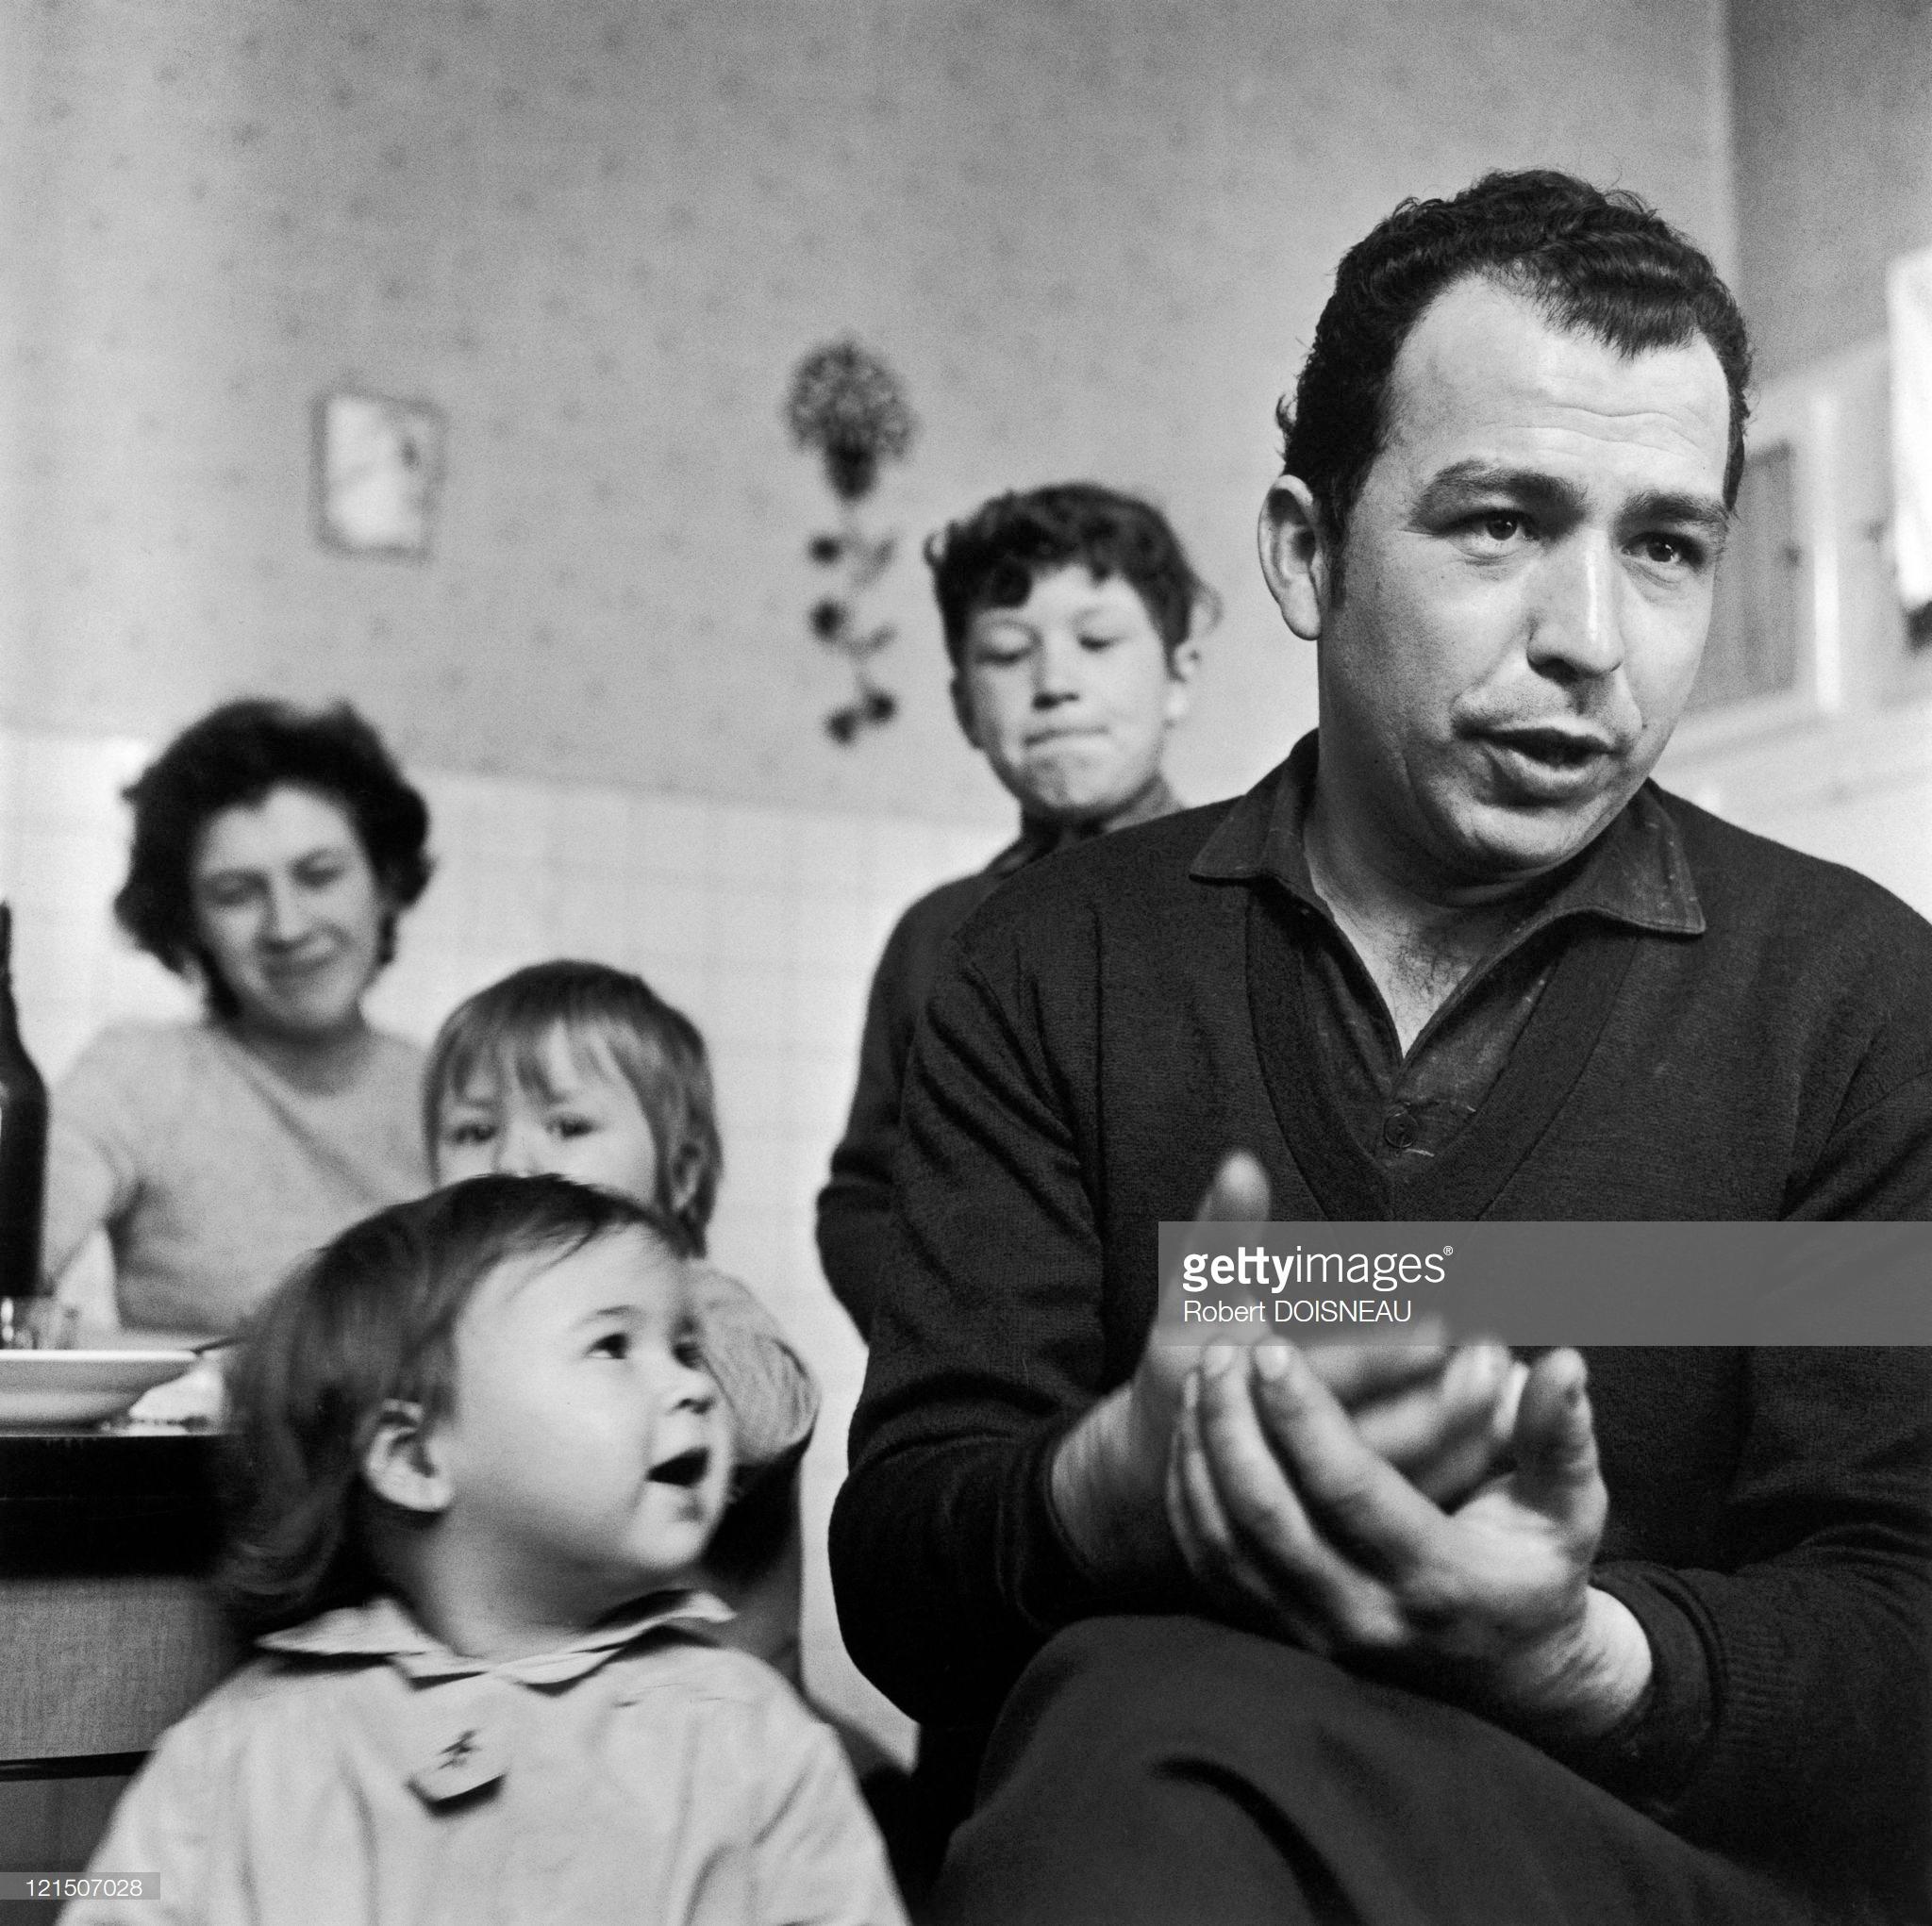 1963. Несовершеннолетние на забастовке. Ланс